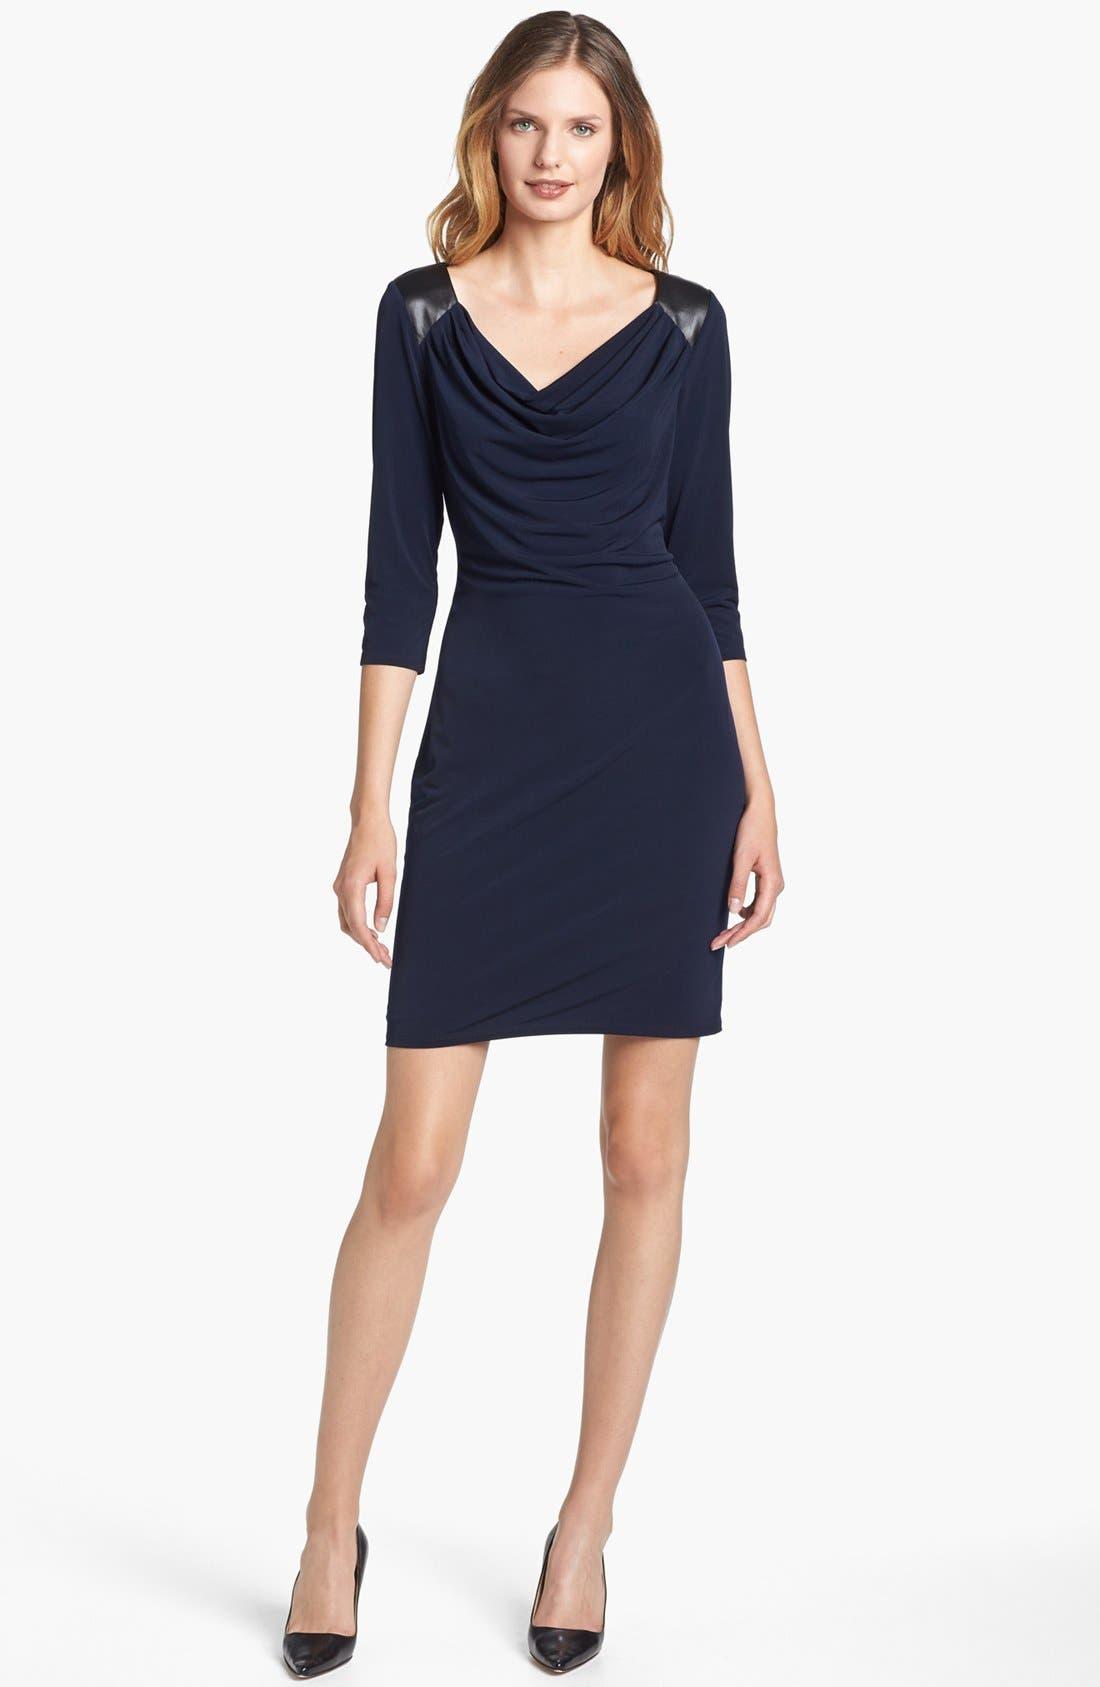 Main Image - Calvin Klein Faux Leather Trim Draped Jersey Dress